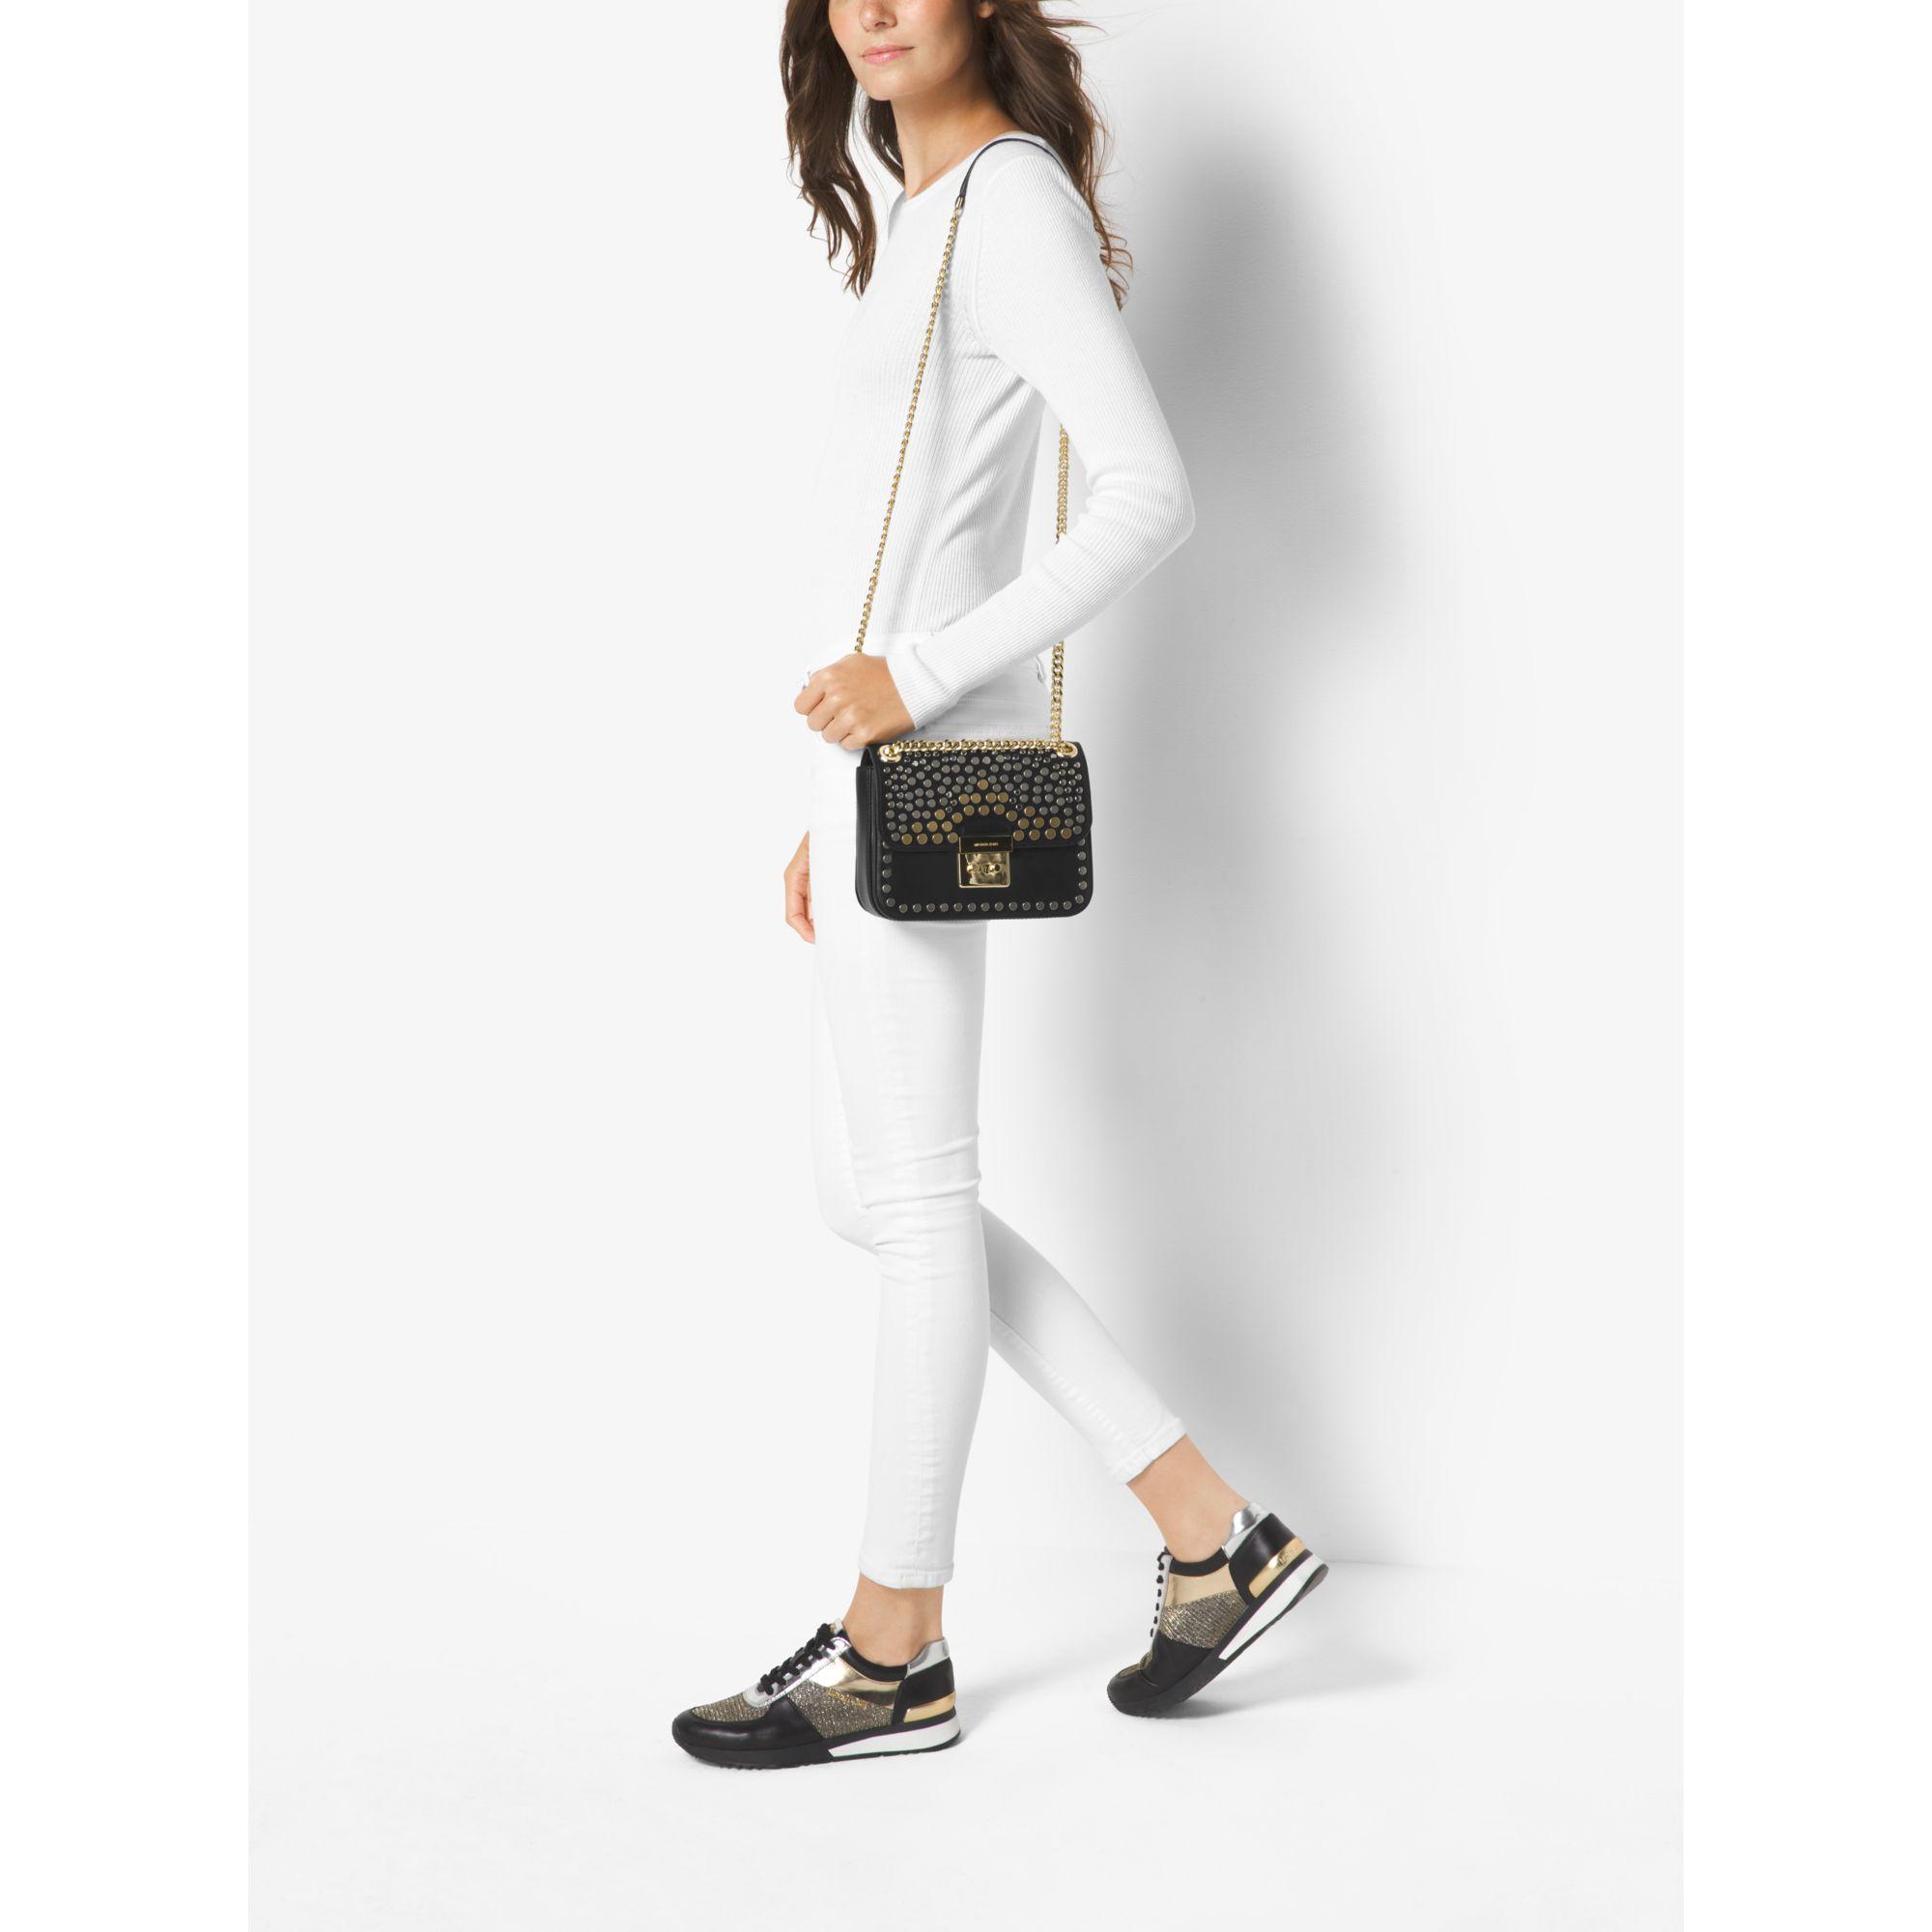 a6f4a8efdf8e Lyst - Michael Kors Sloan Editor Medium Studded Leather Shoulder Bag ...